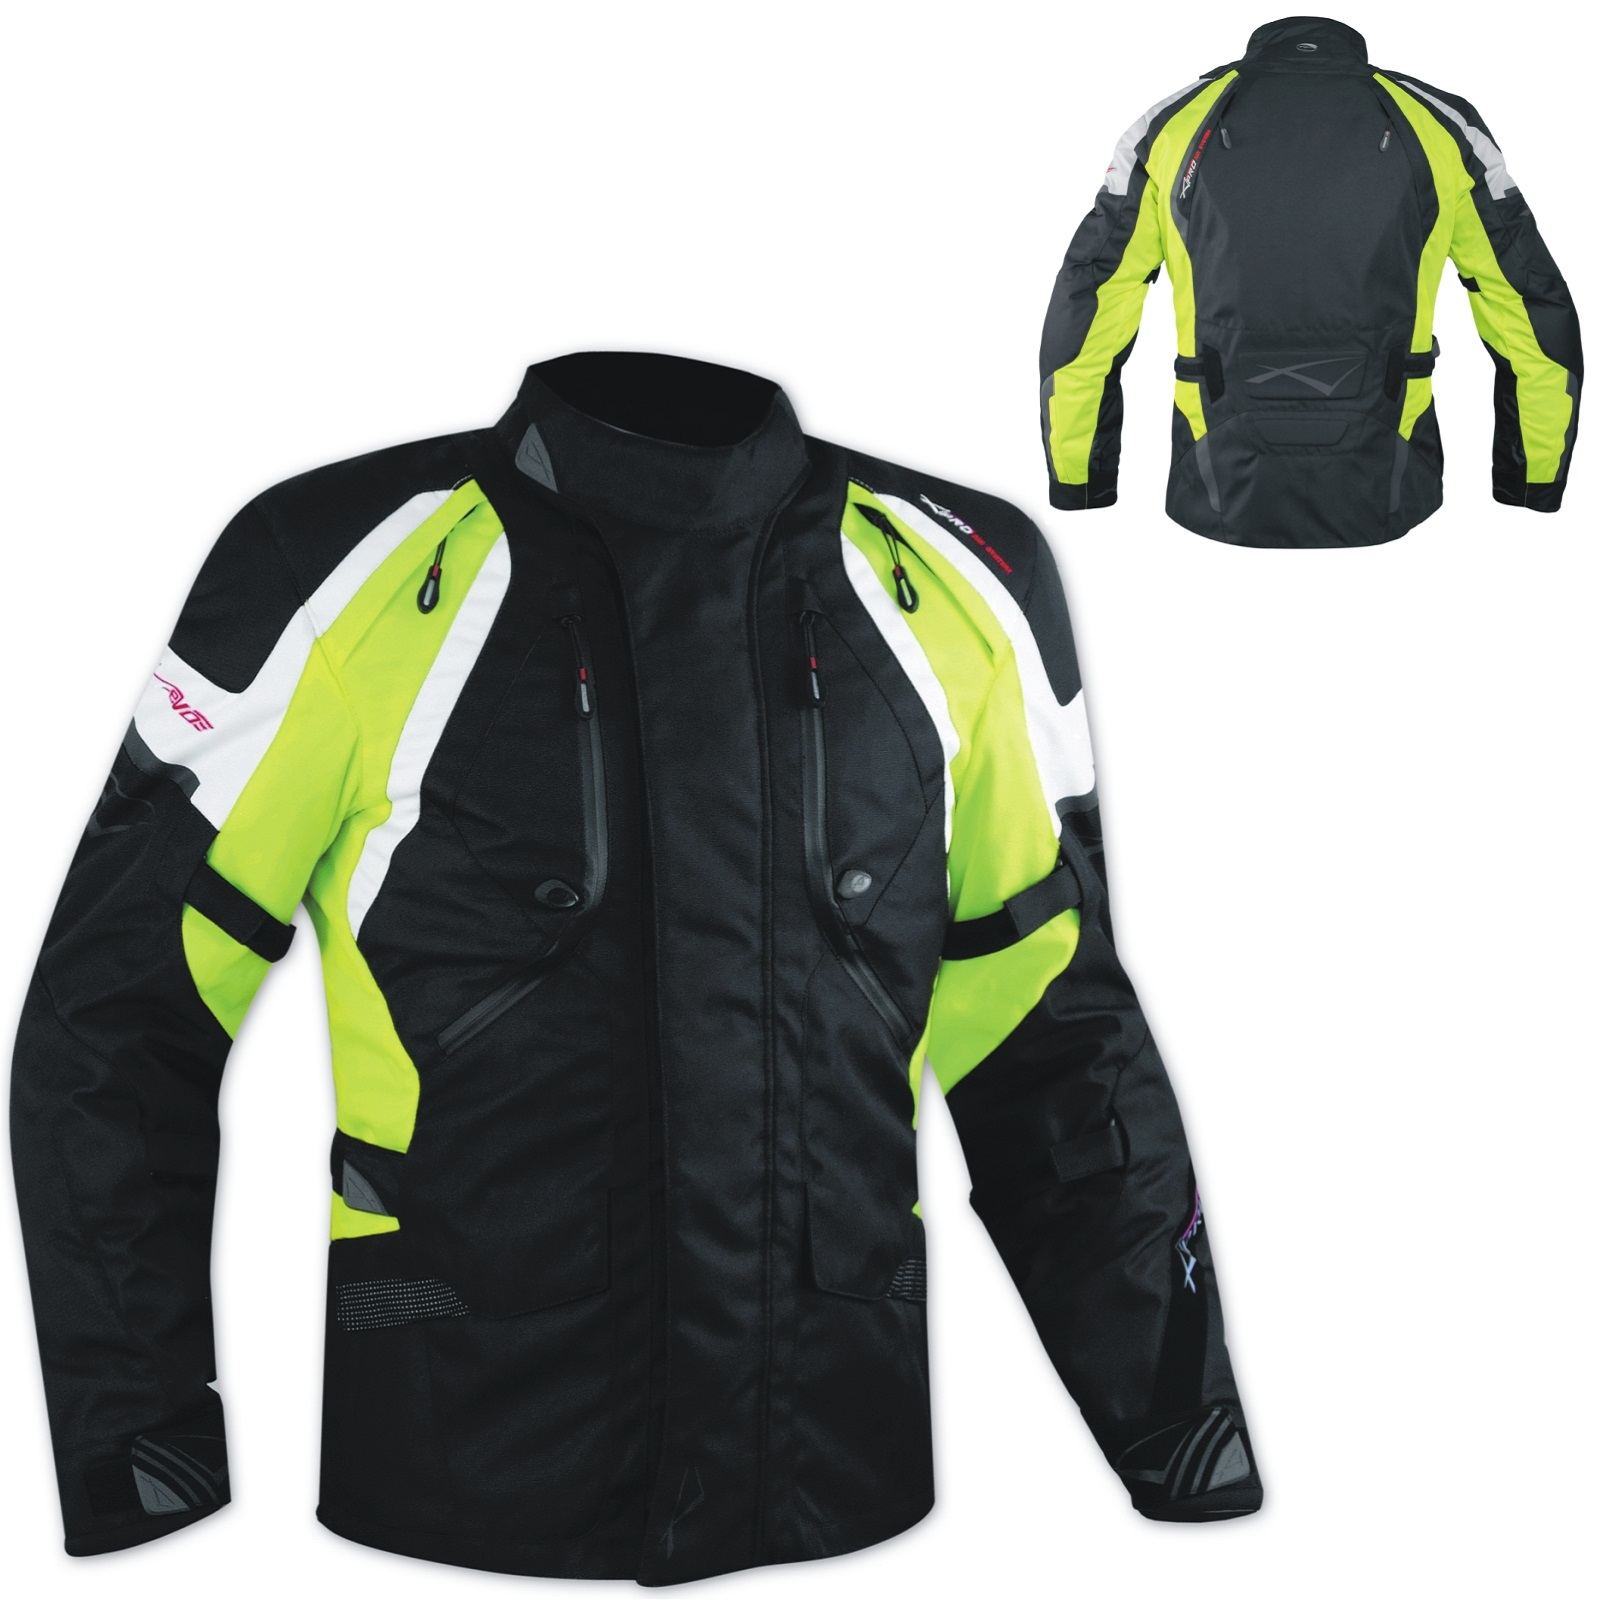 Cordura-Chaqueta-Moto-Enduro-Touring-Turismo-impermeable-Off-Road-4-estaciones